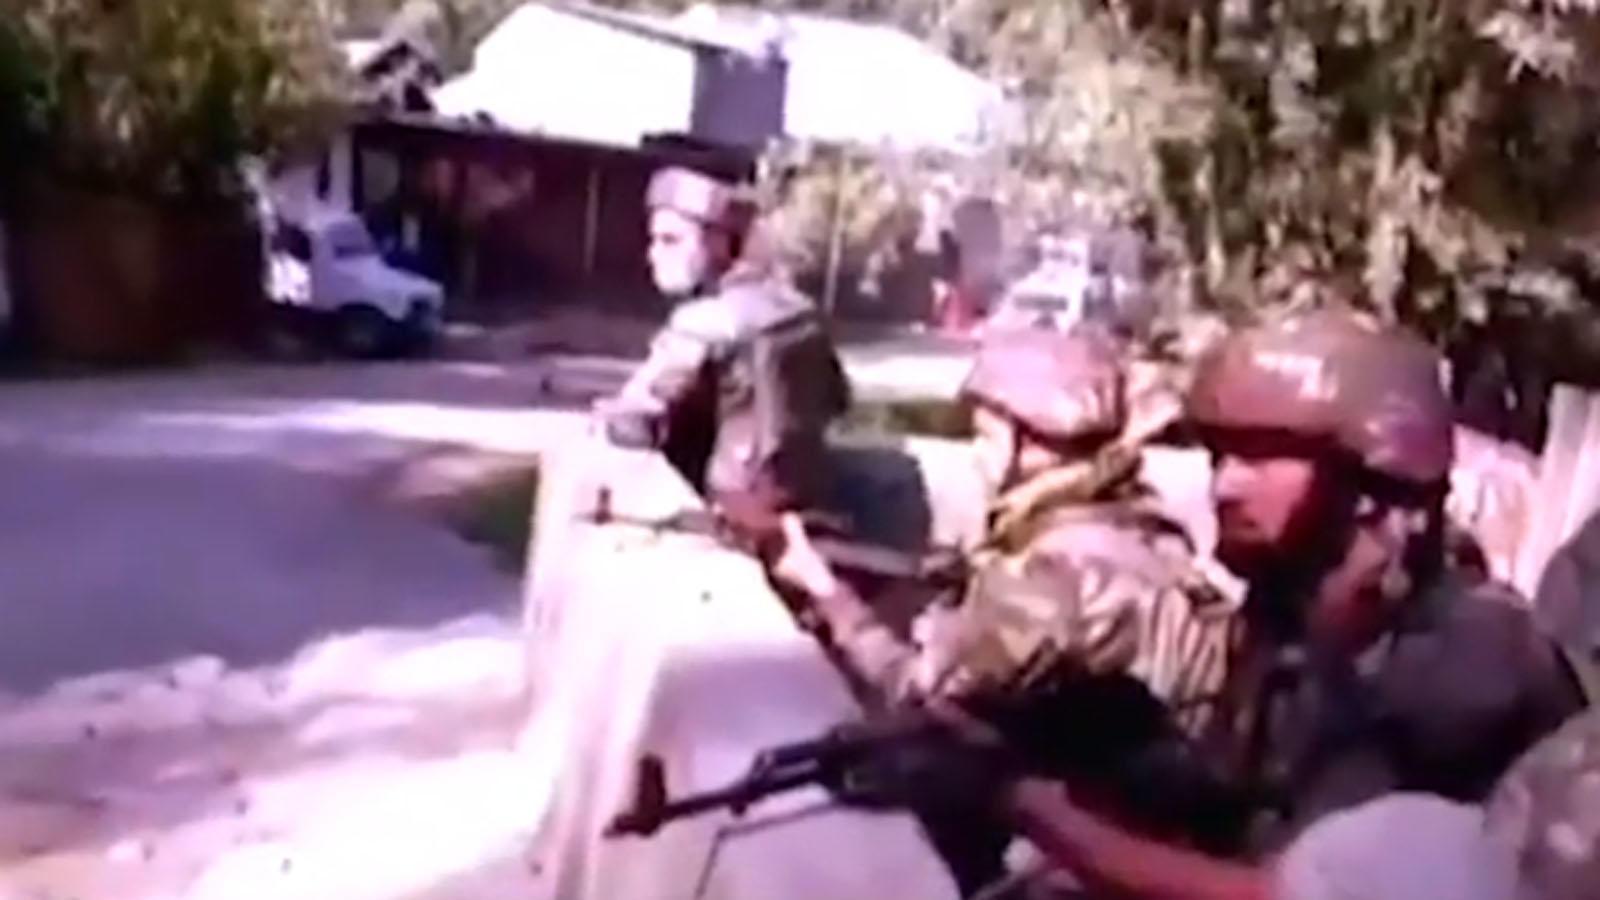 terrorist-gunned-down-in-encounter-in-jks-bandipora